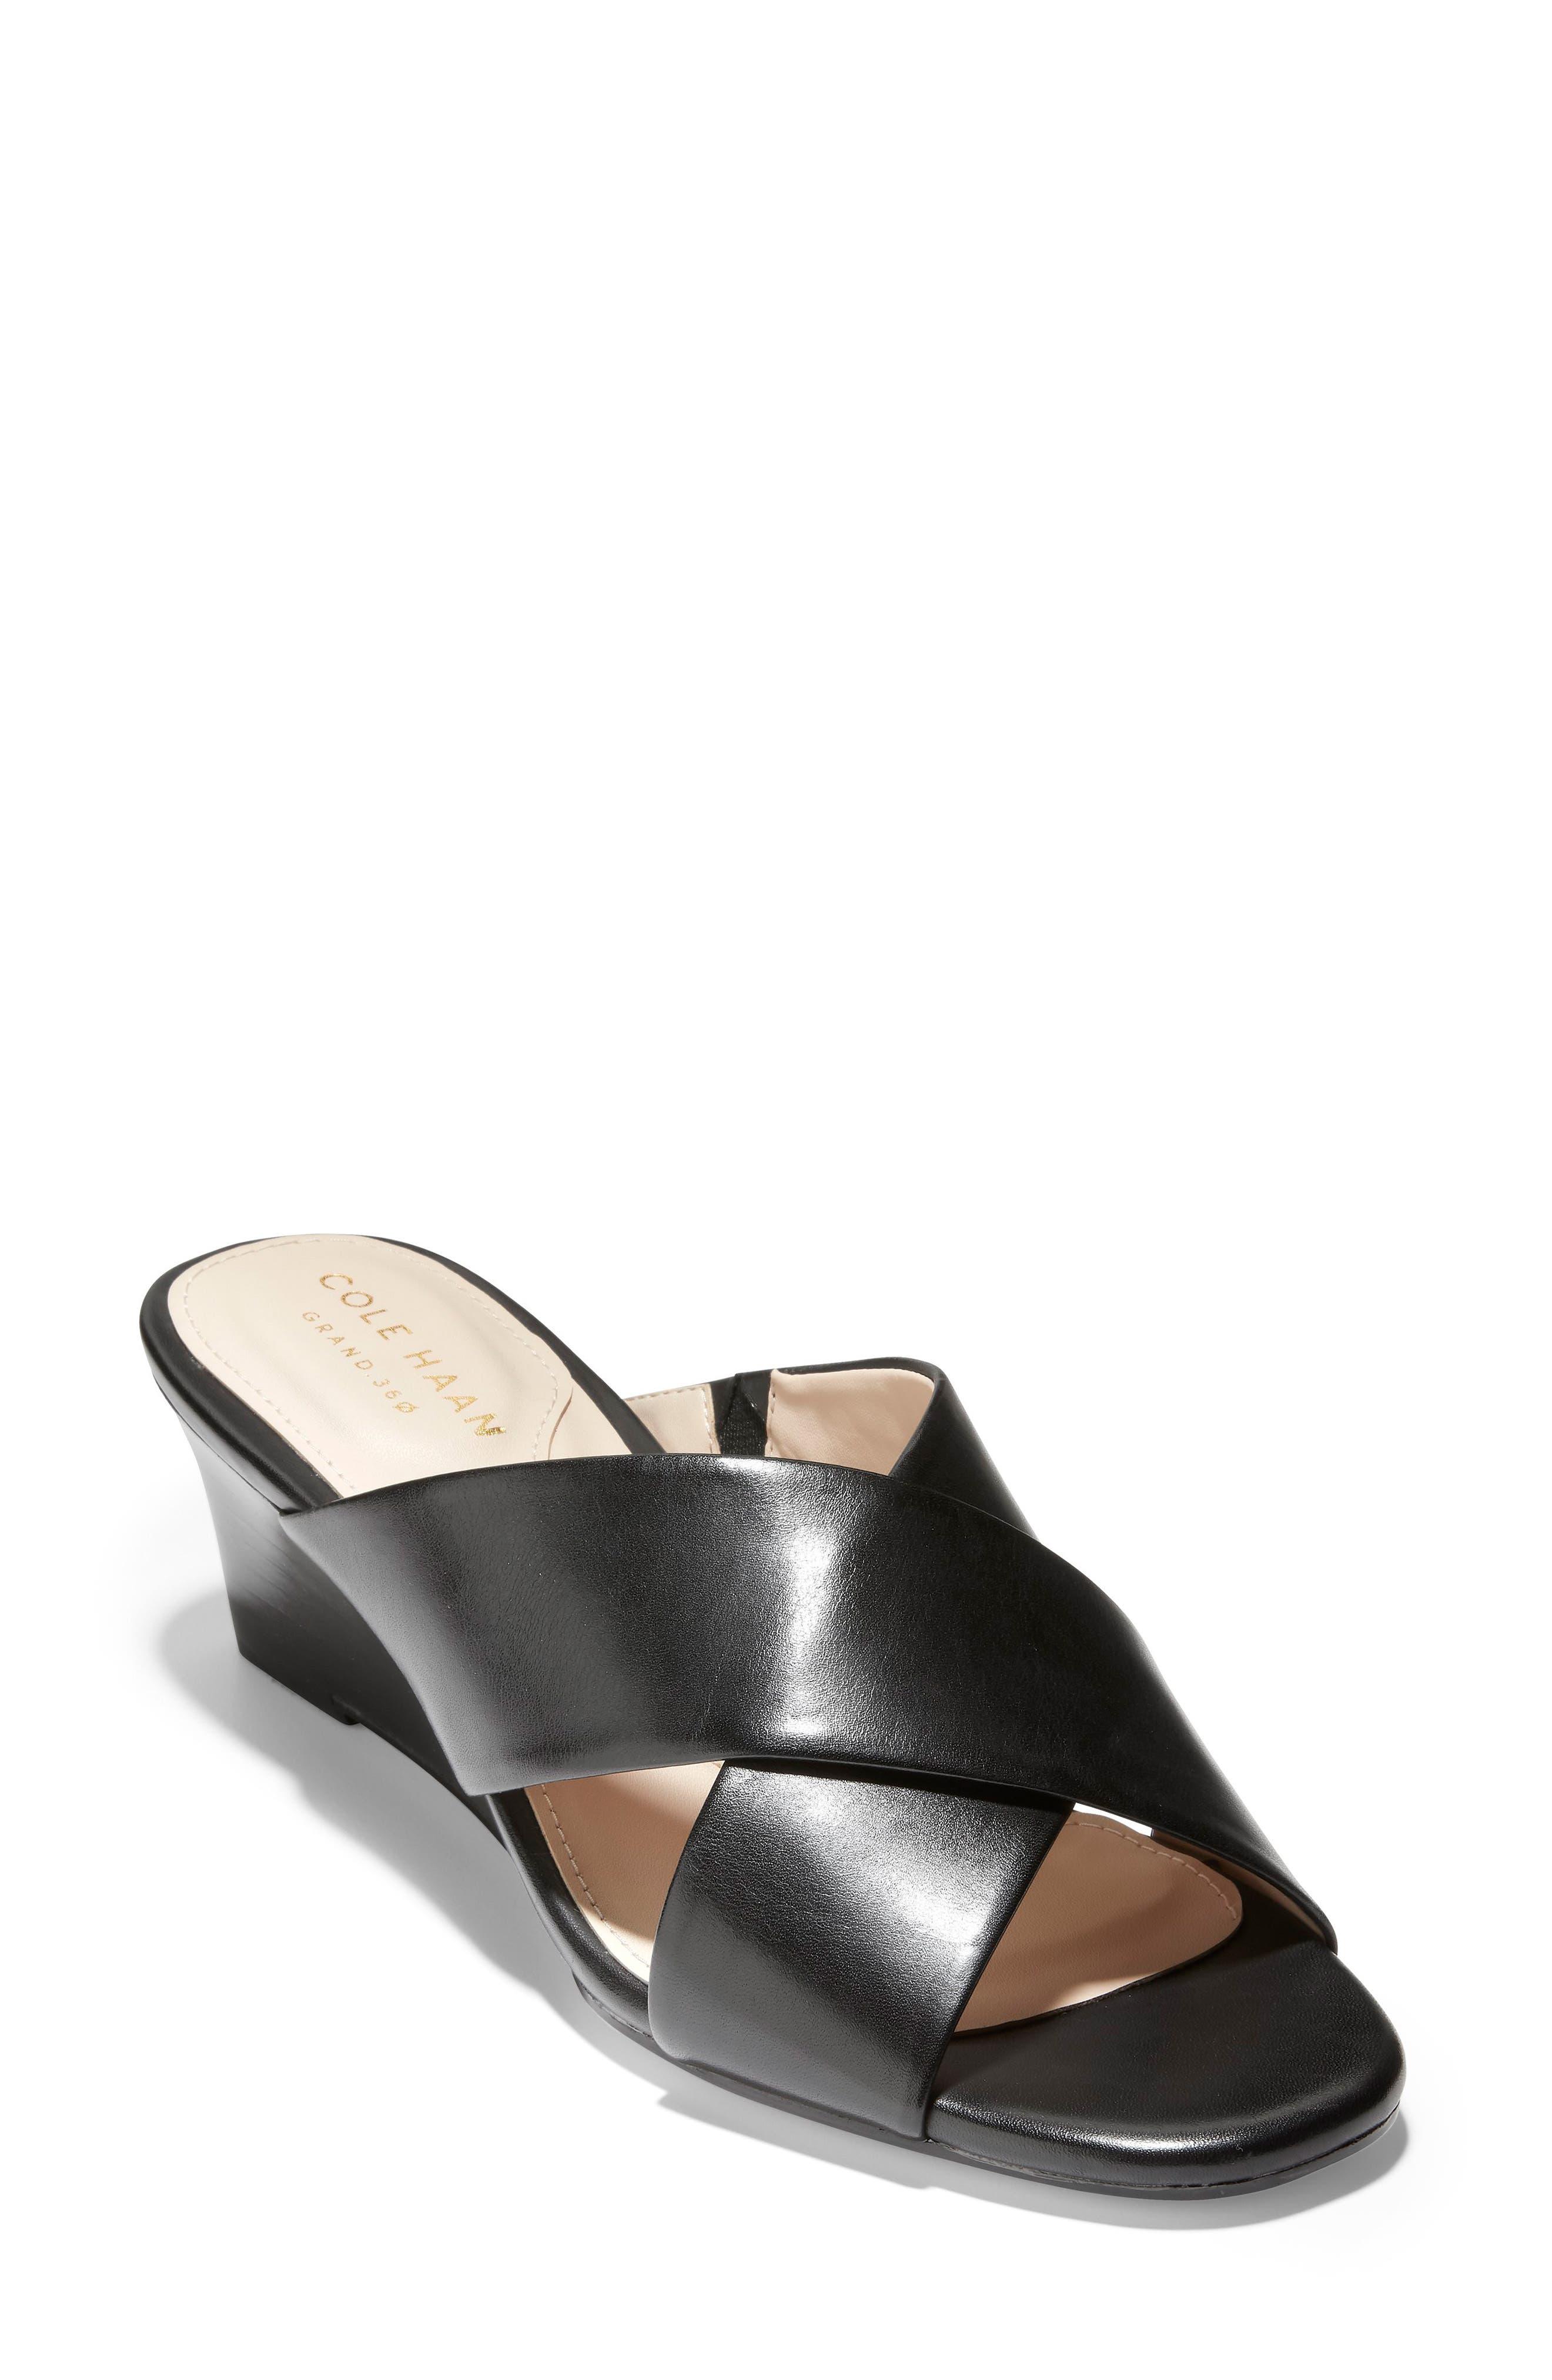 Adley Wedge Sandal, Main, color, BLACK LEATHER